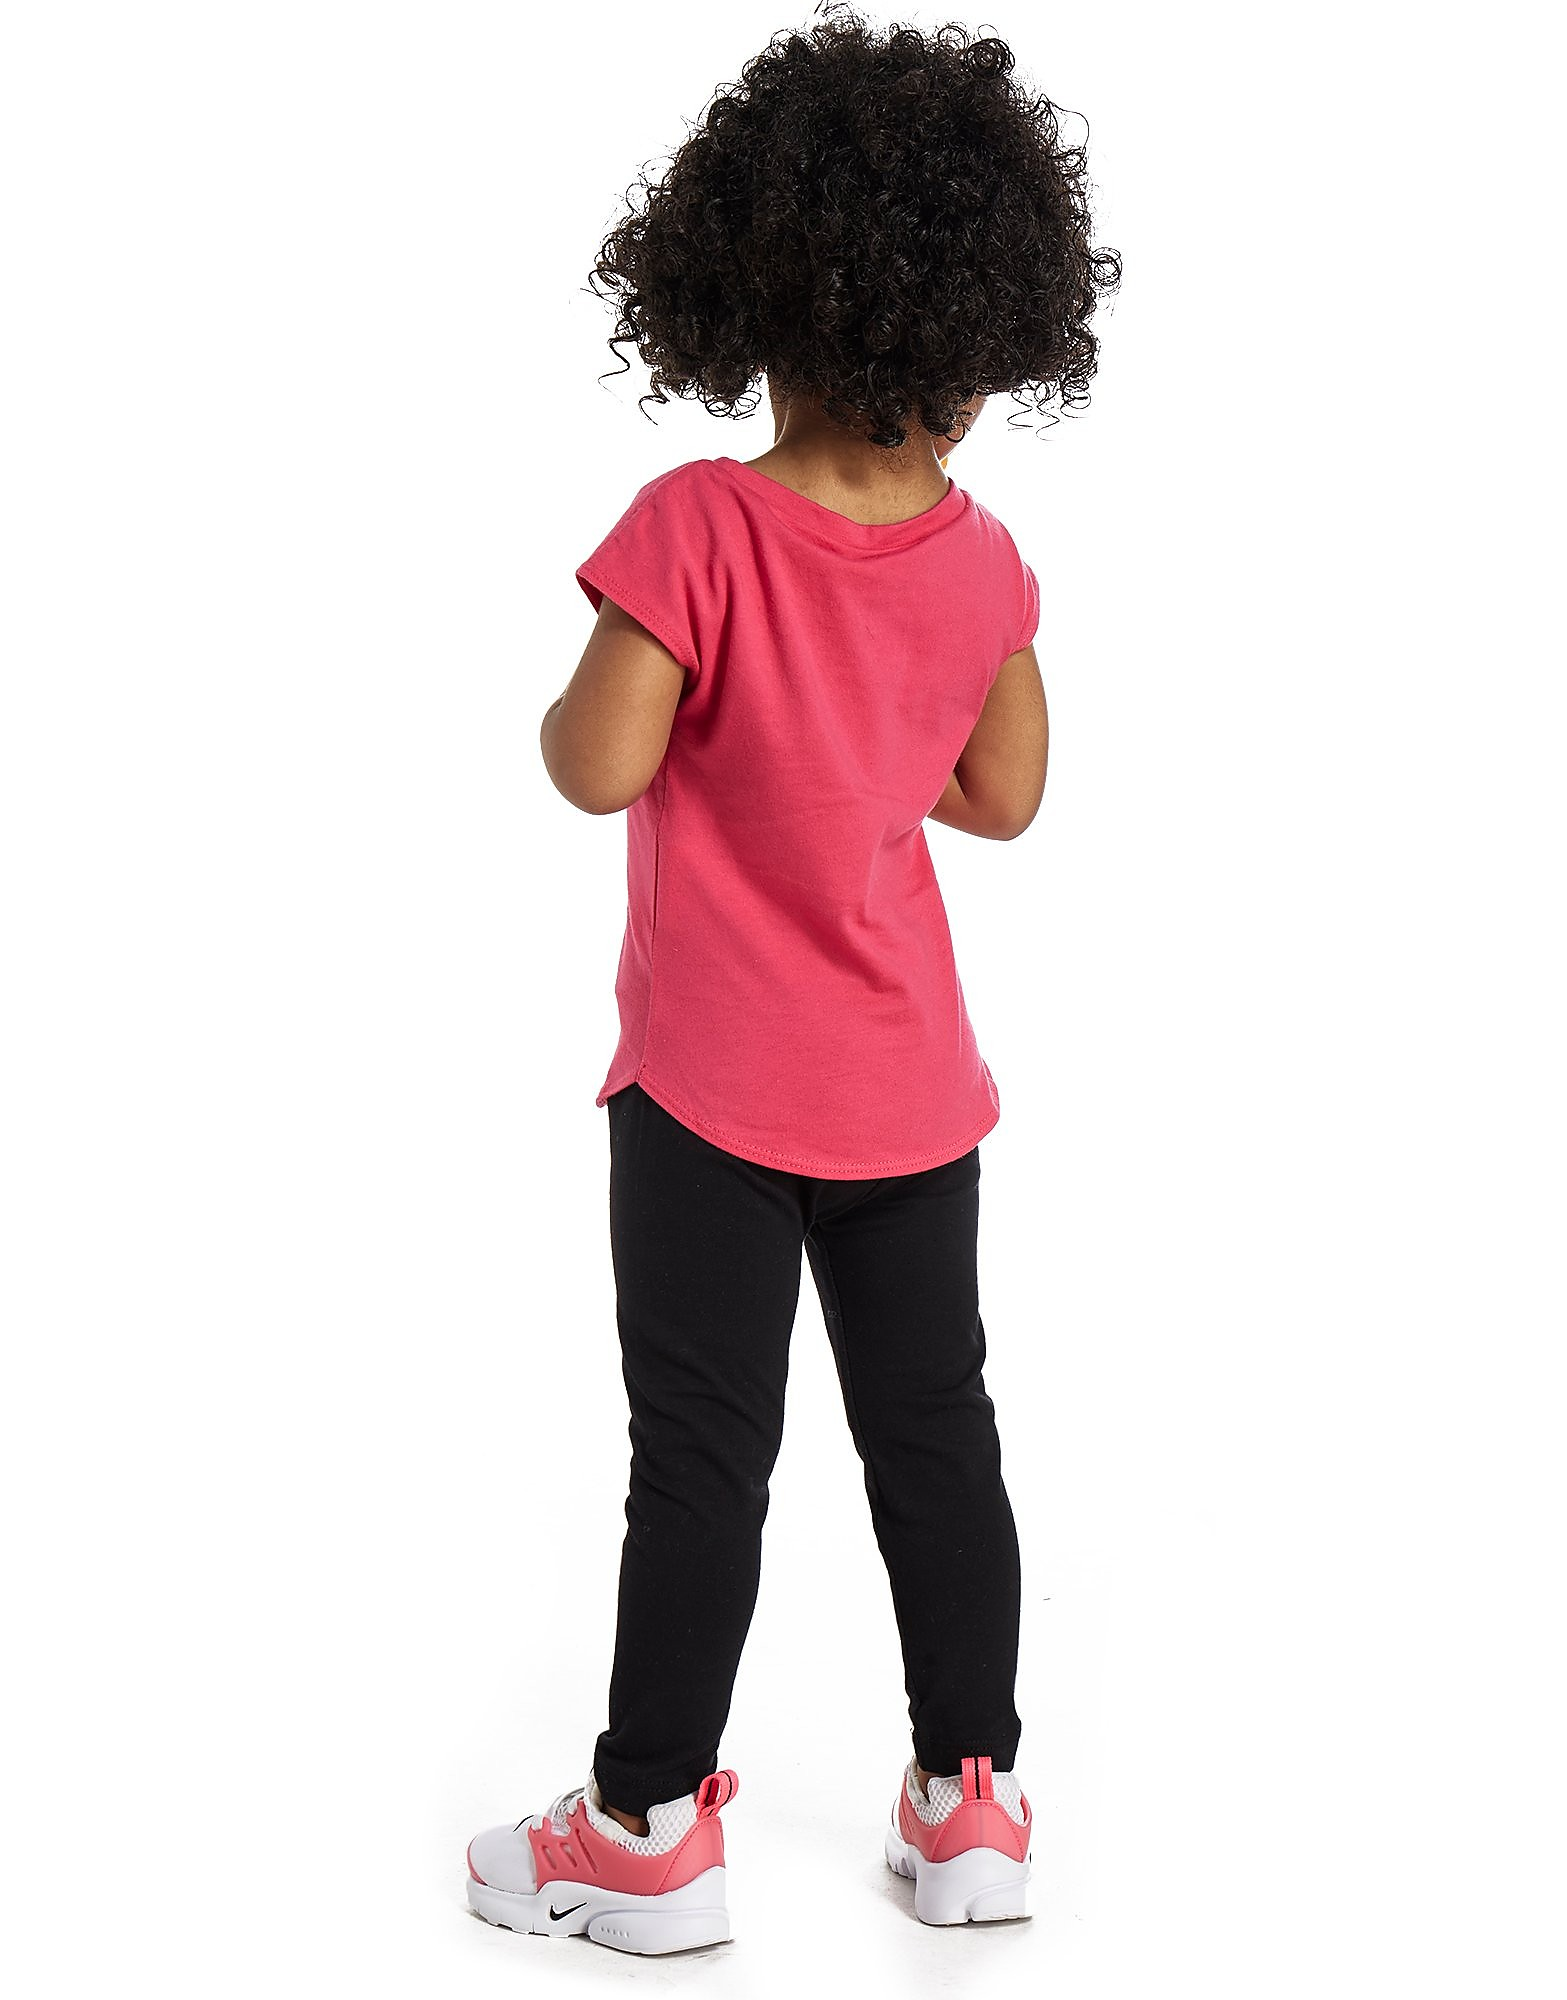 Nike Girls' Iridescent T-Shirt Infant